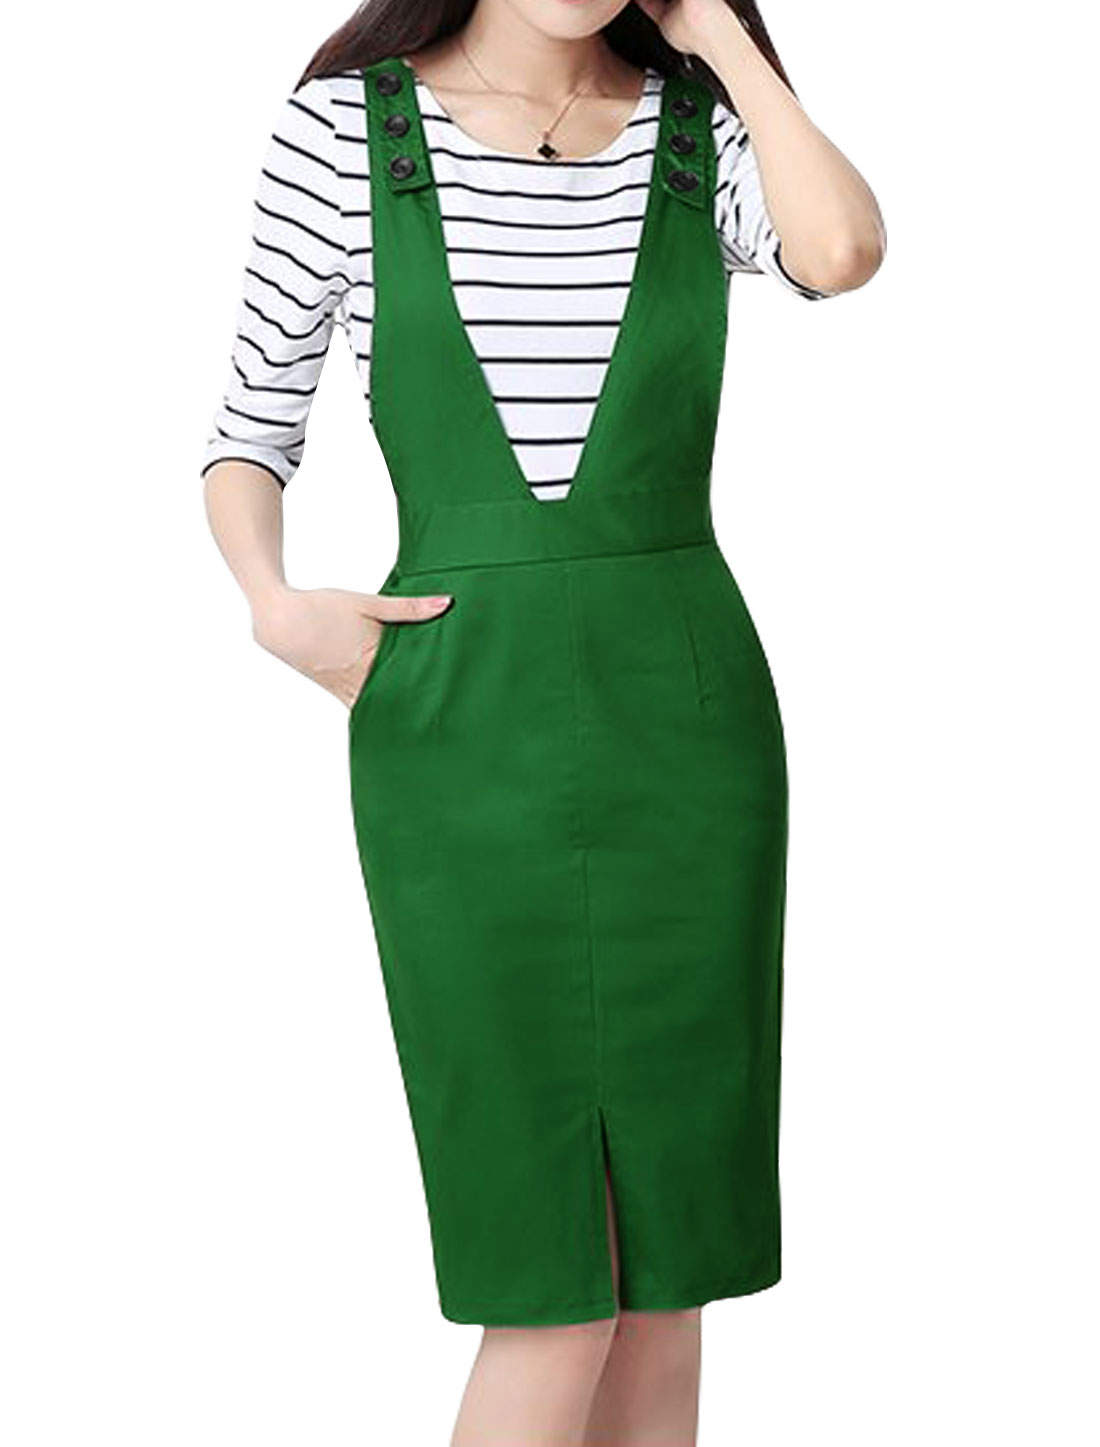 Women Adjustable Strap Split Front Suspender Skirt Green S